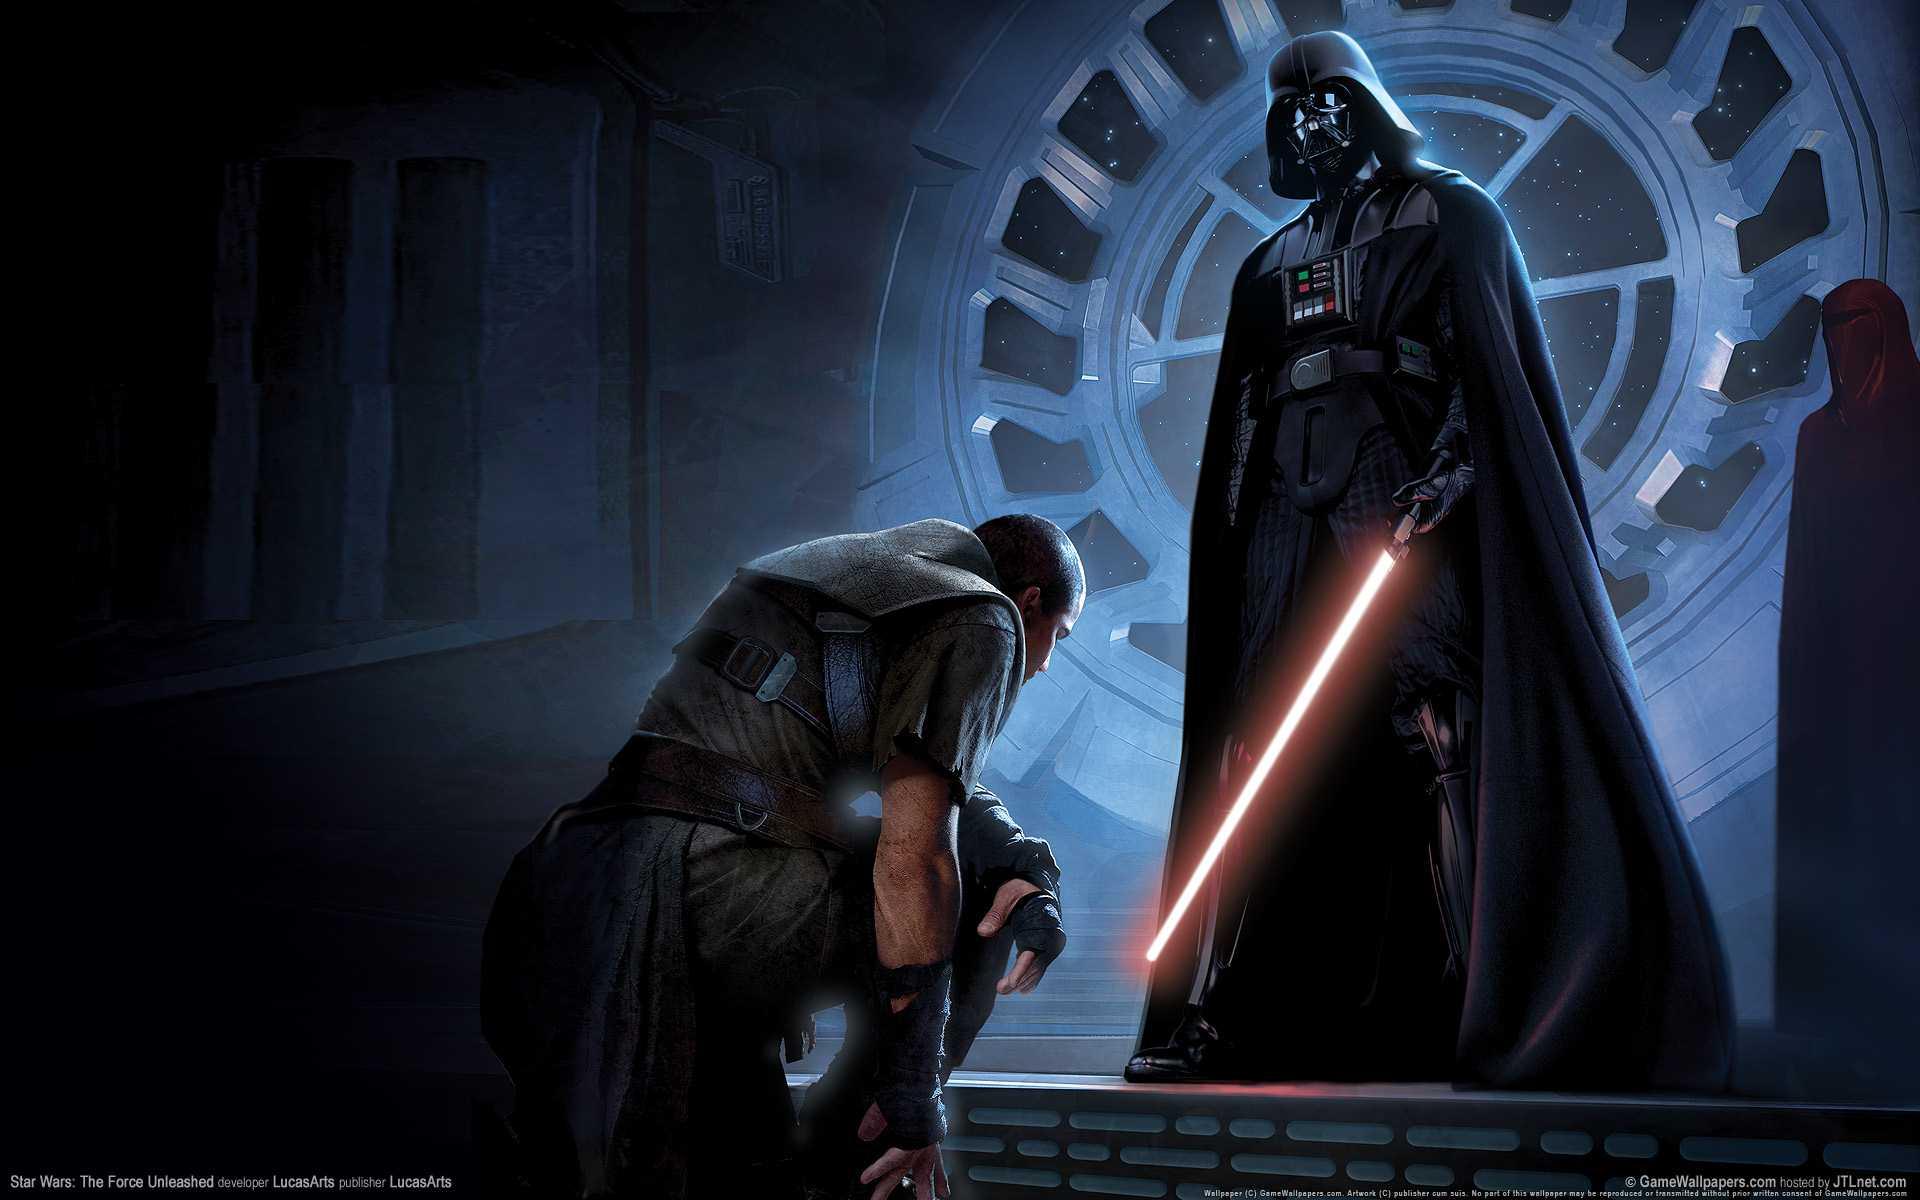 Anakin Skywalker Darth Vader Wallpapers Wallpaper Cave